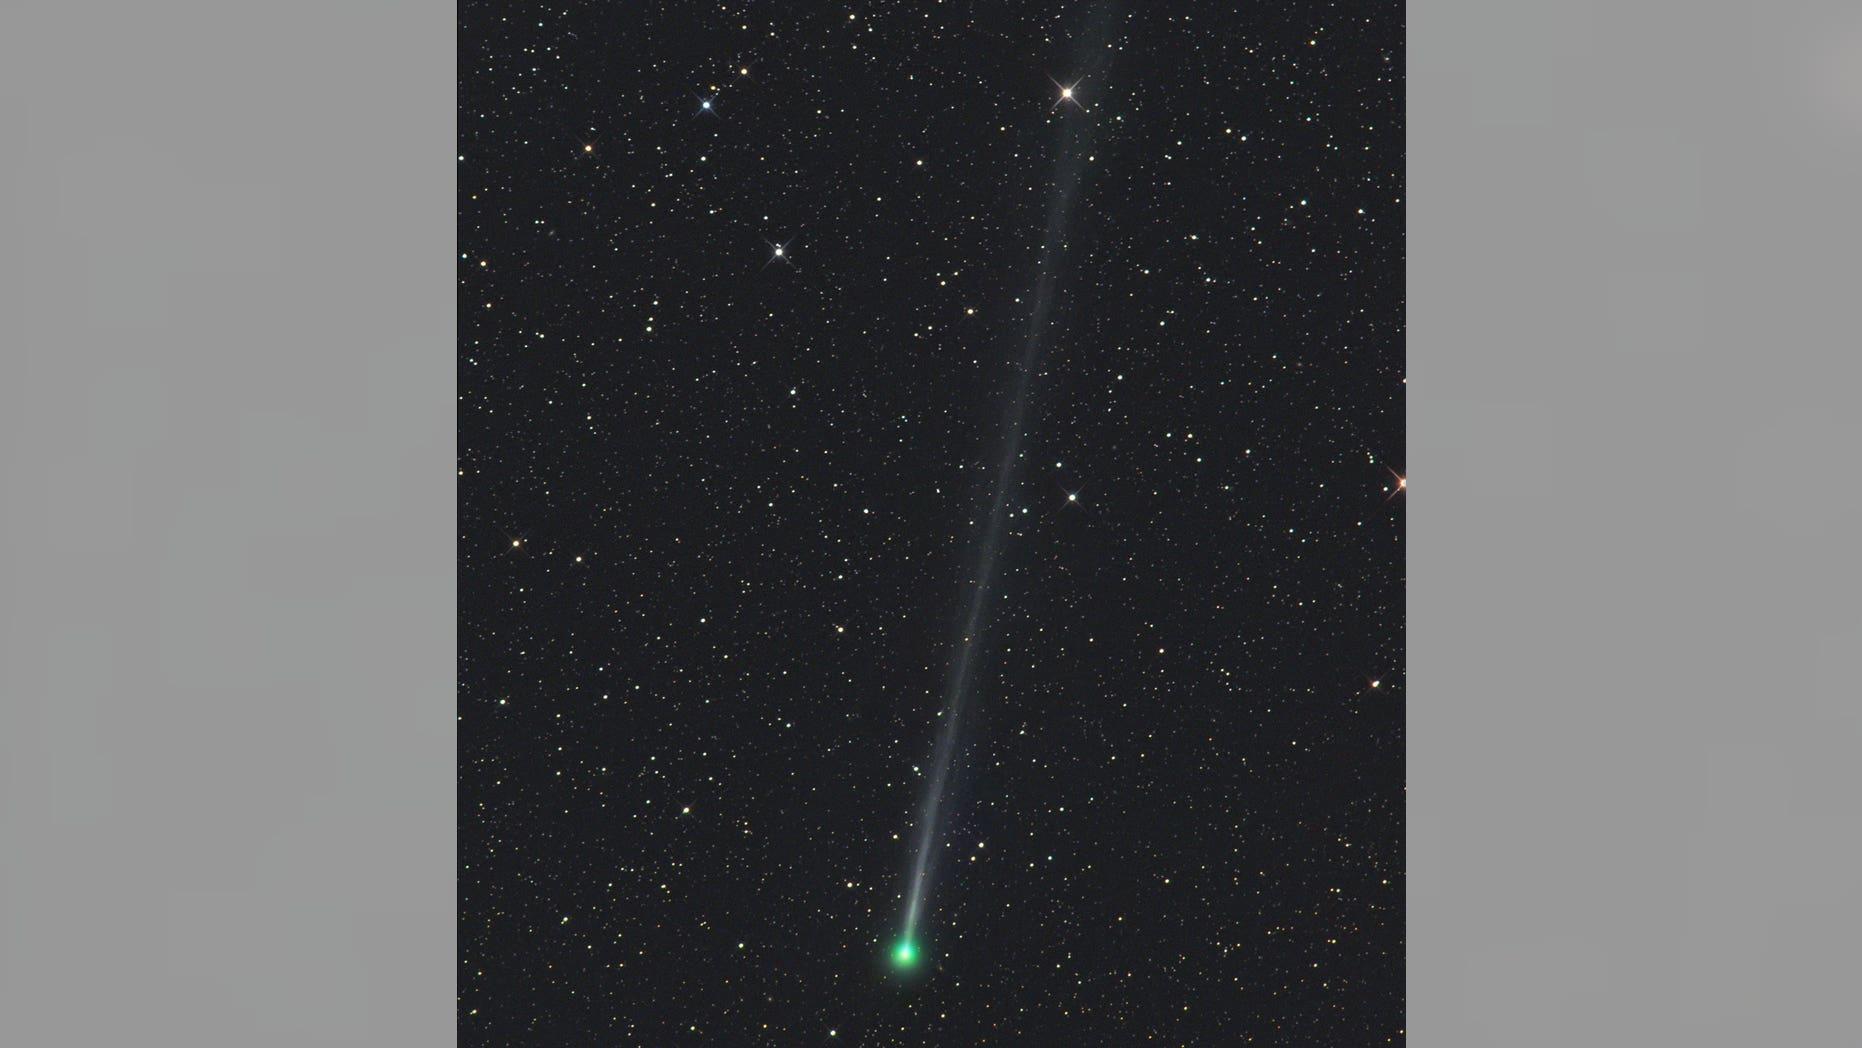 nasa comet tracking - 927×616